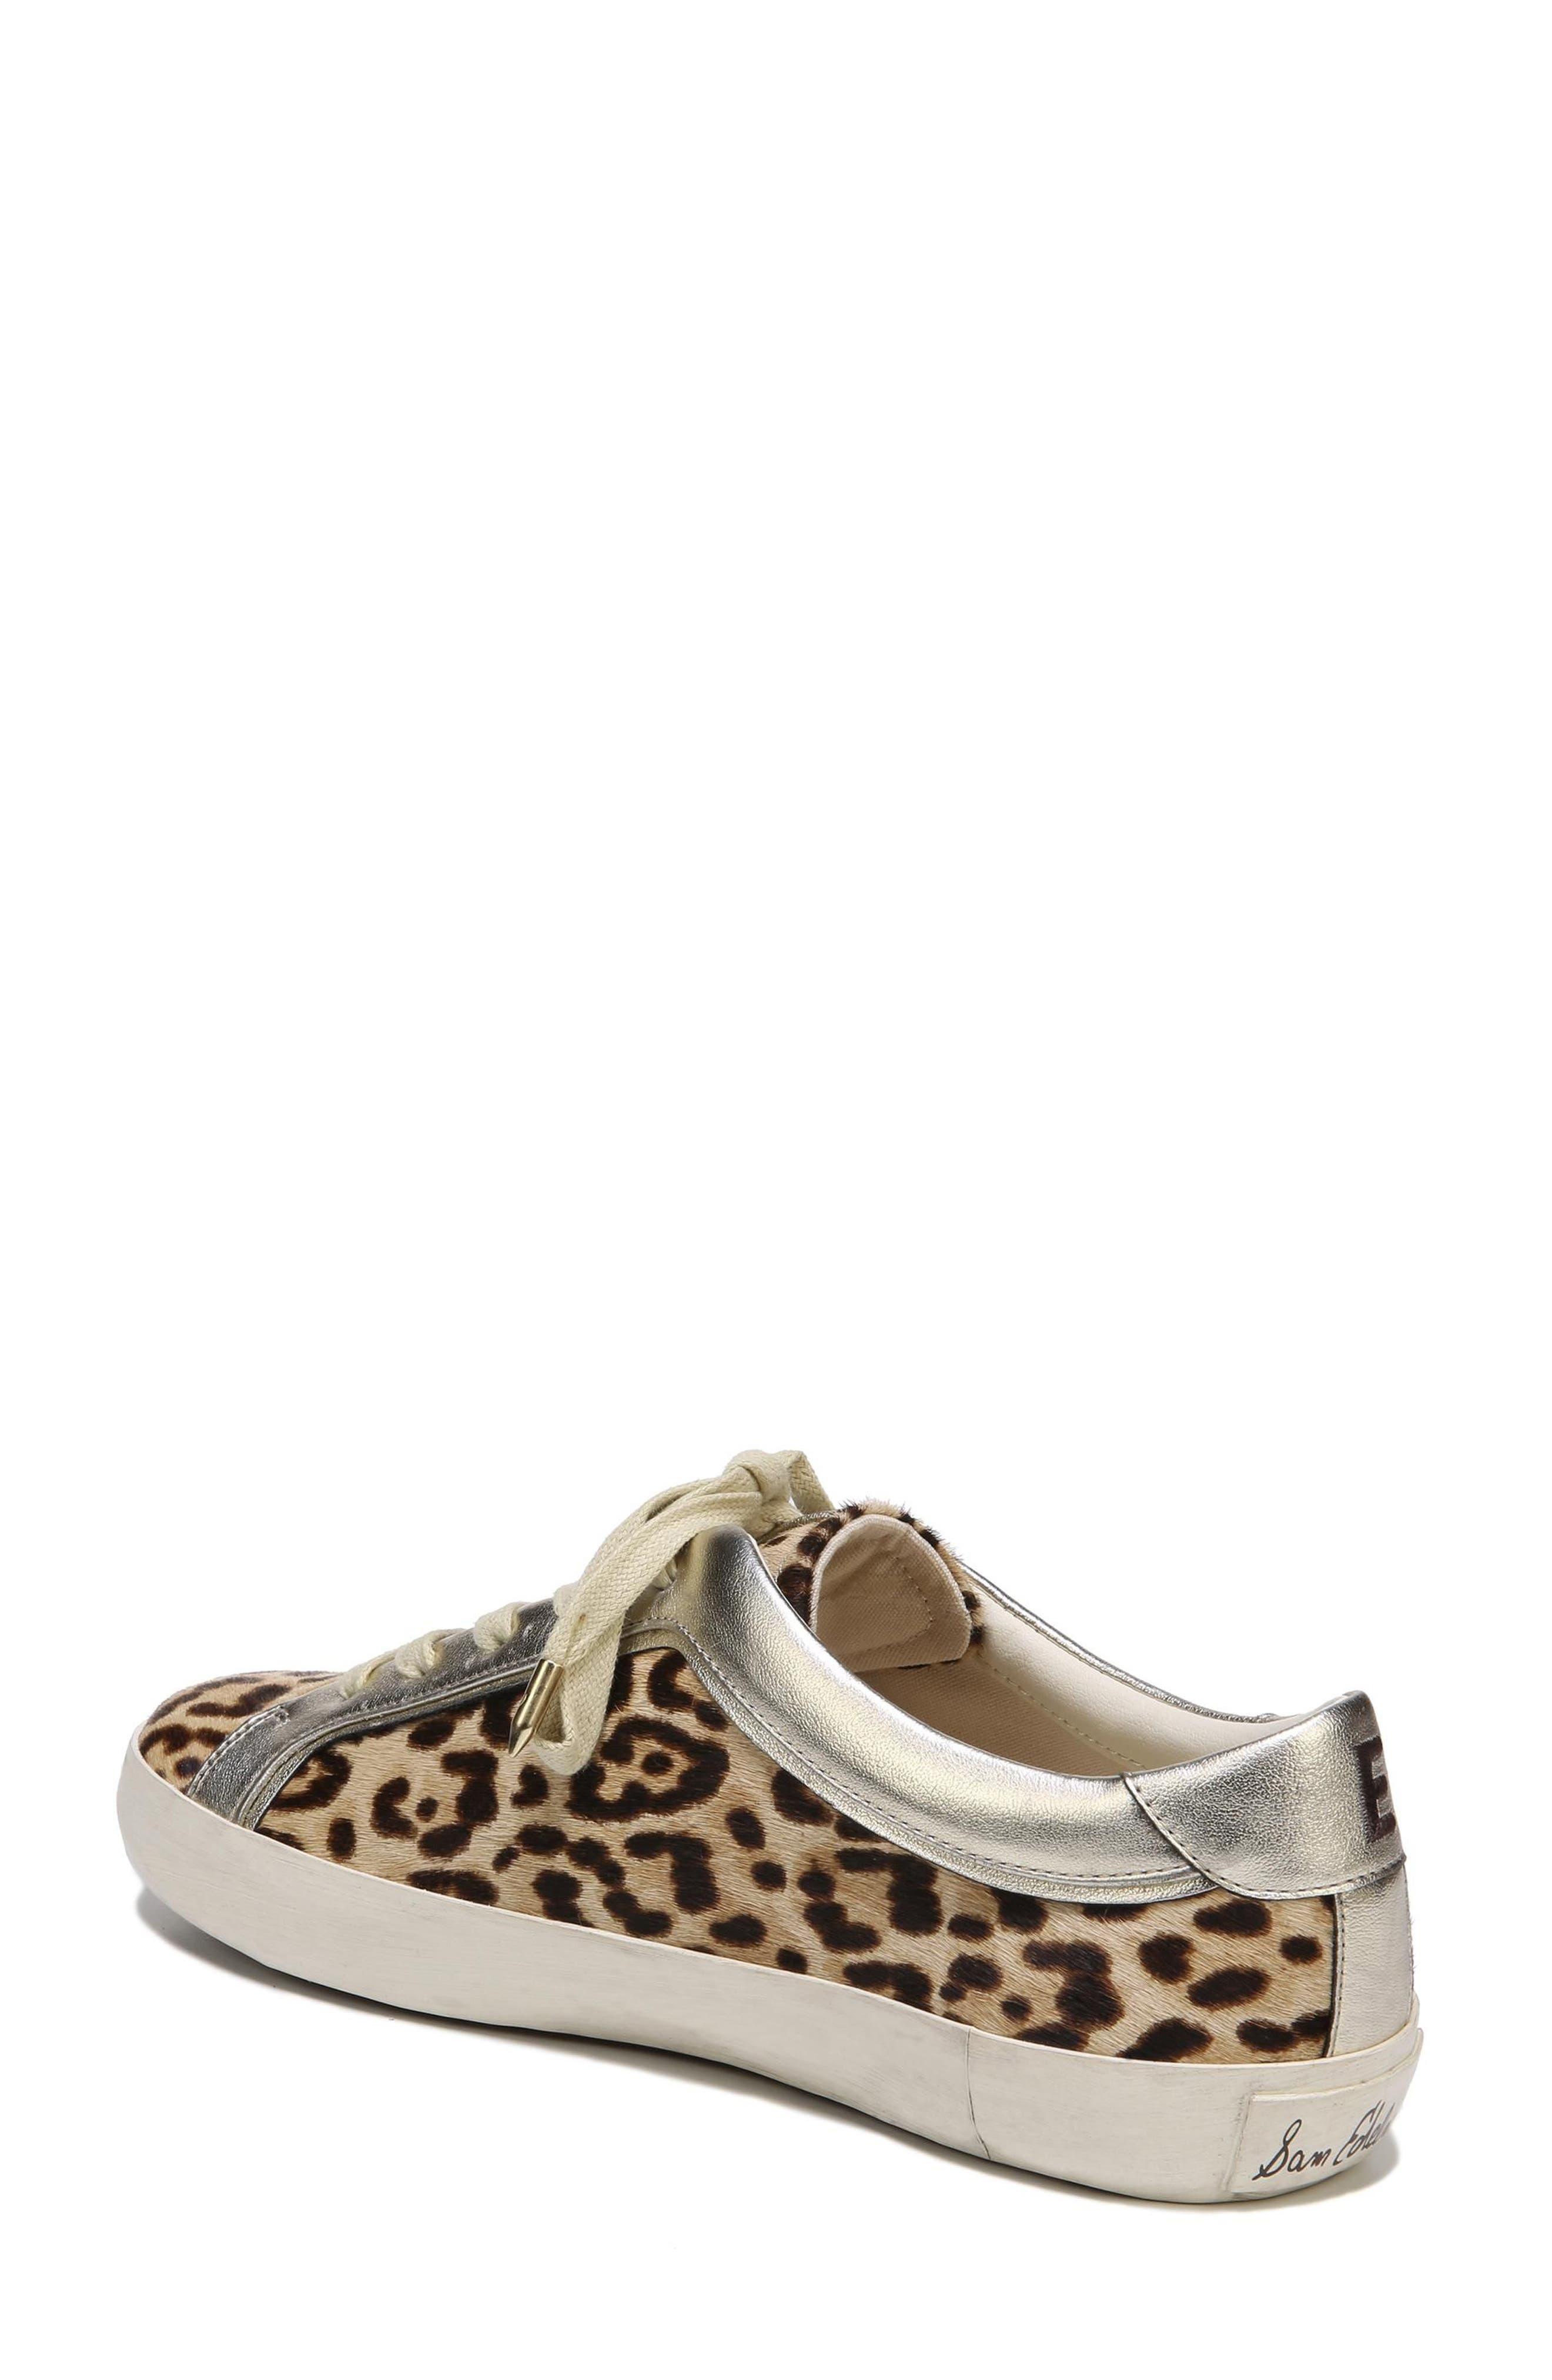 Britton 2 Sneaker,                             Alternate thumbnail 2, color,                             Leopard Brahma Hair